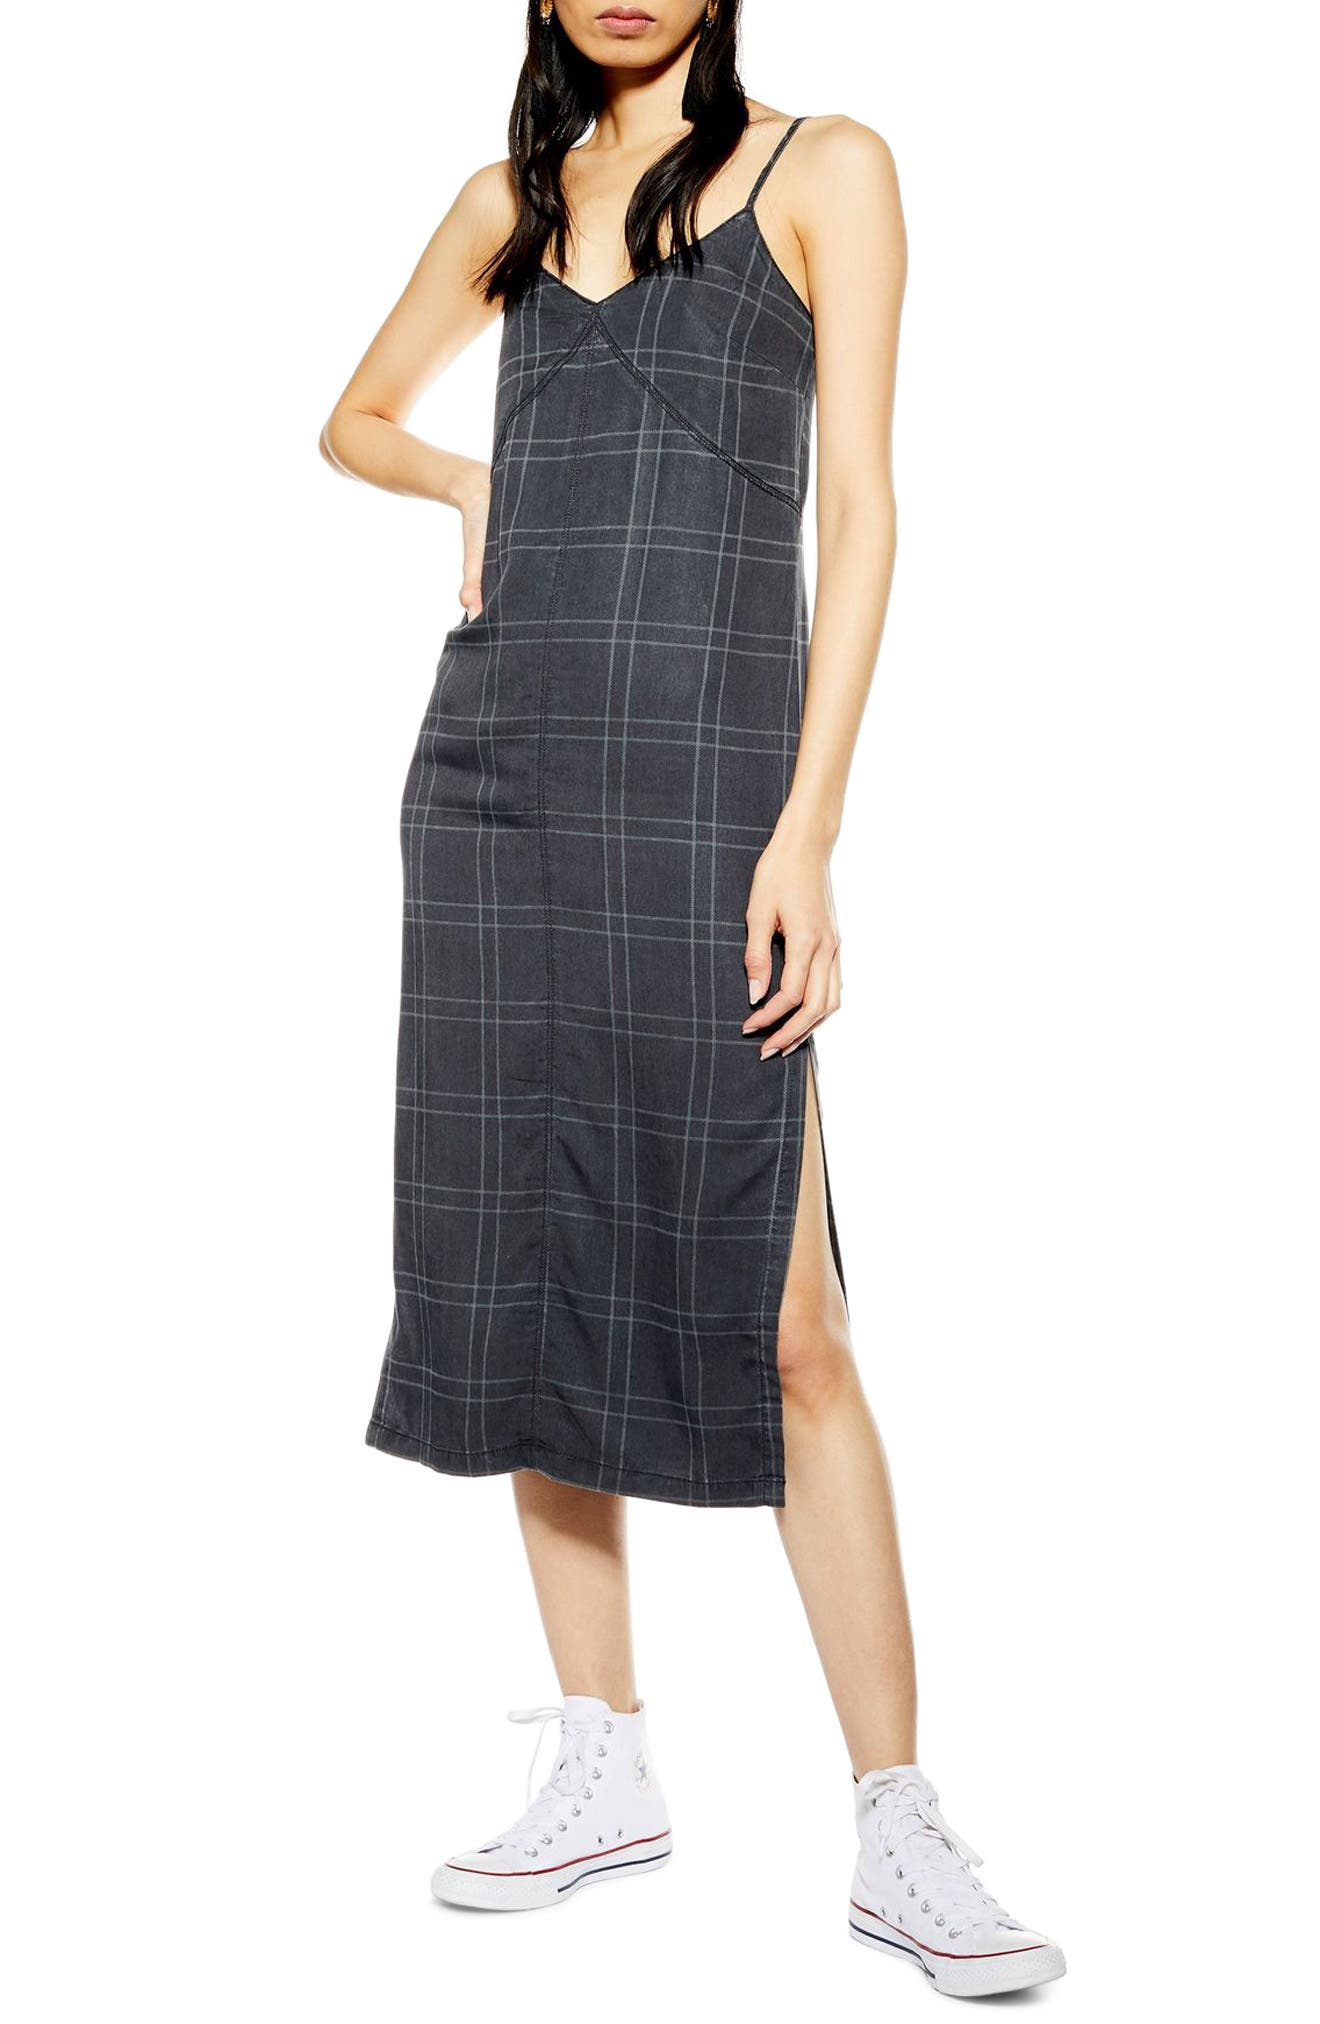 Topshop Check Denim Midi Dress, US (fits like 0-2) - Black